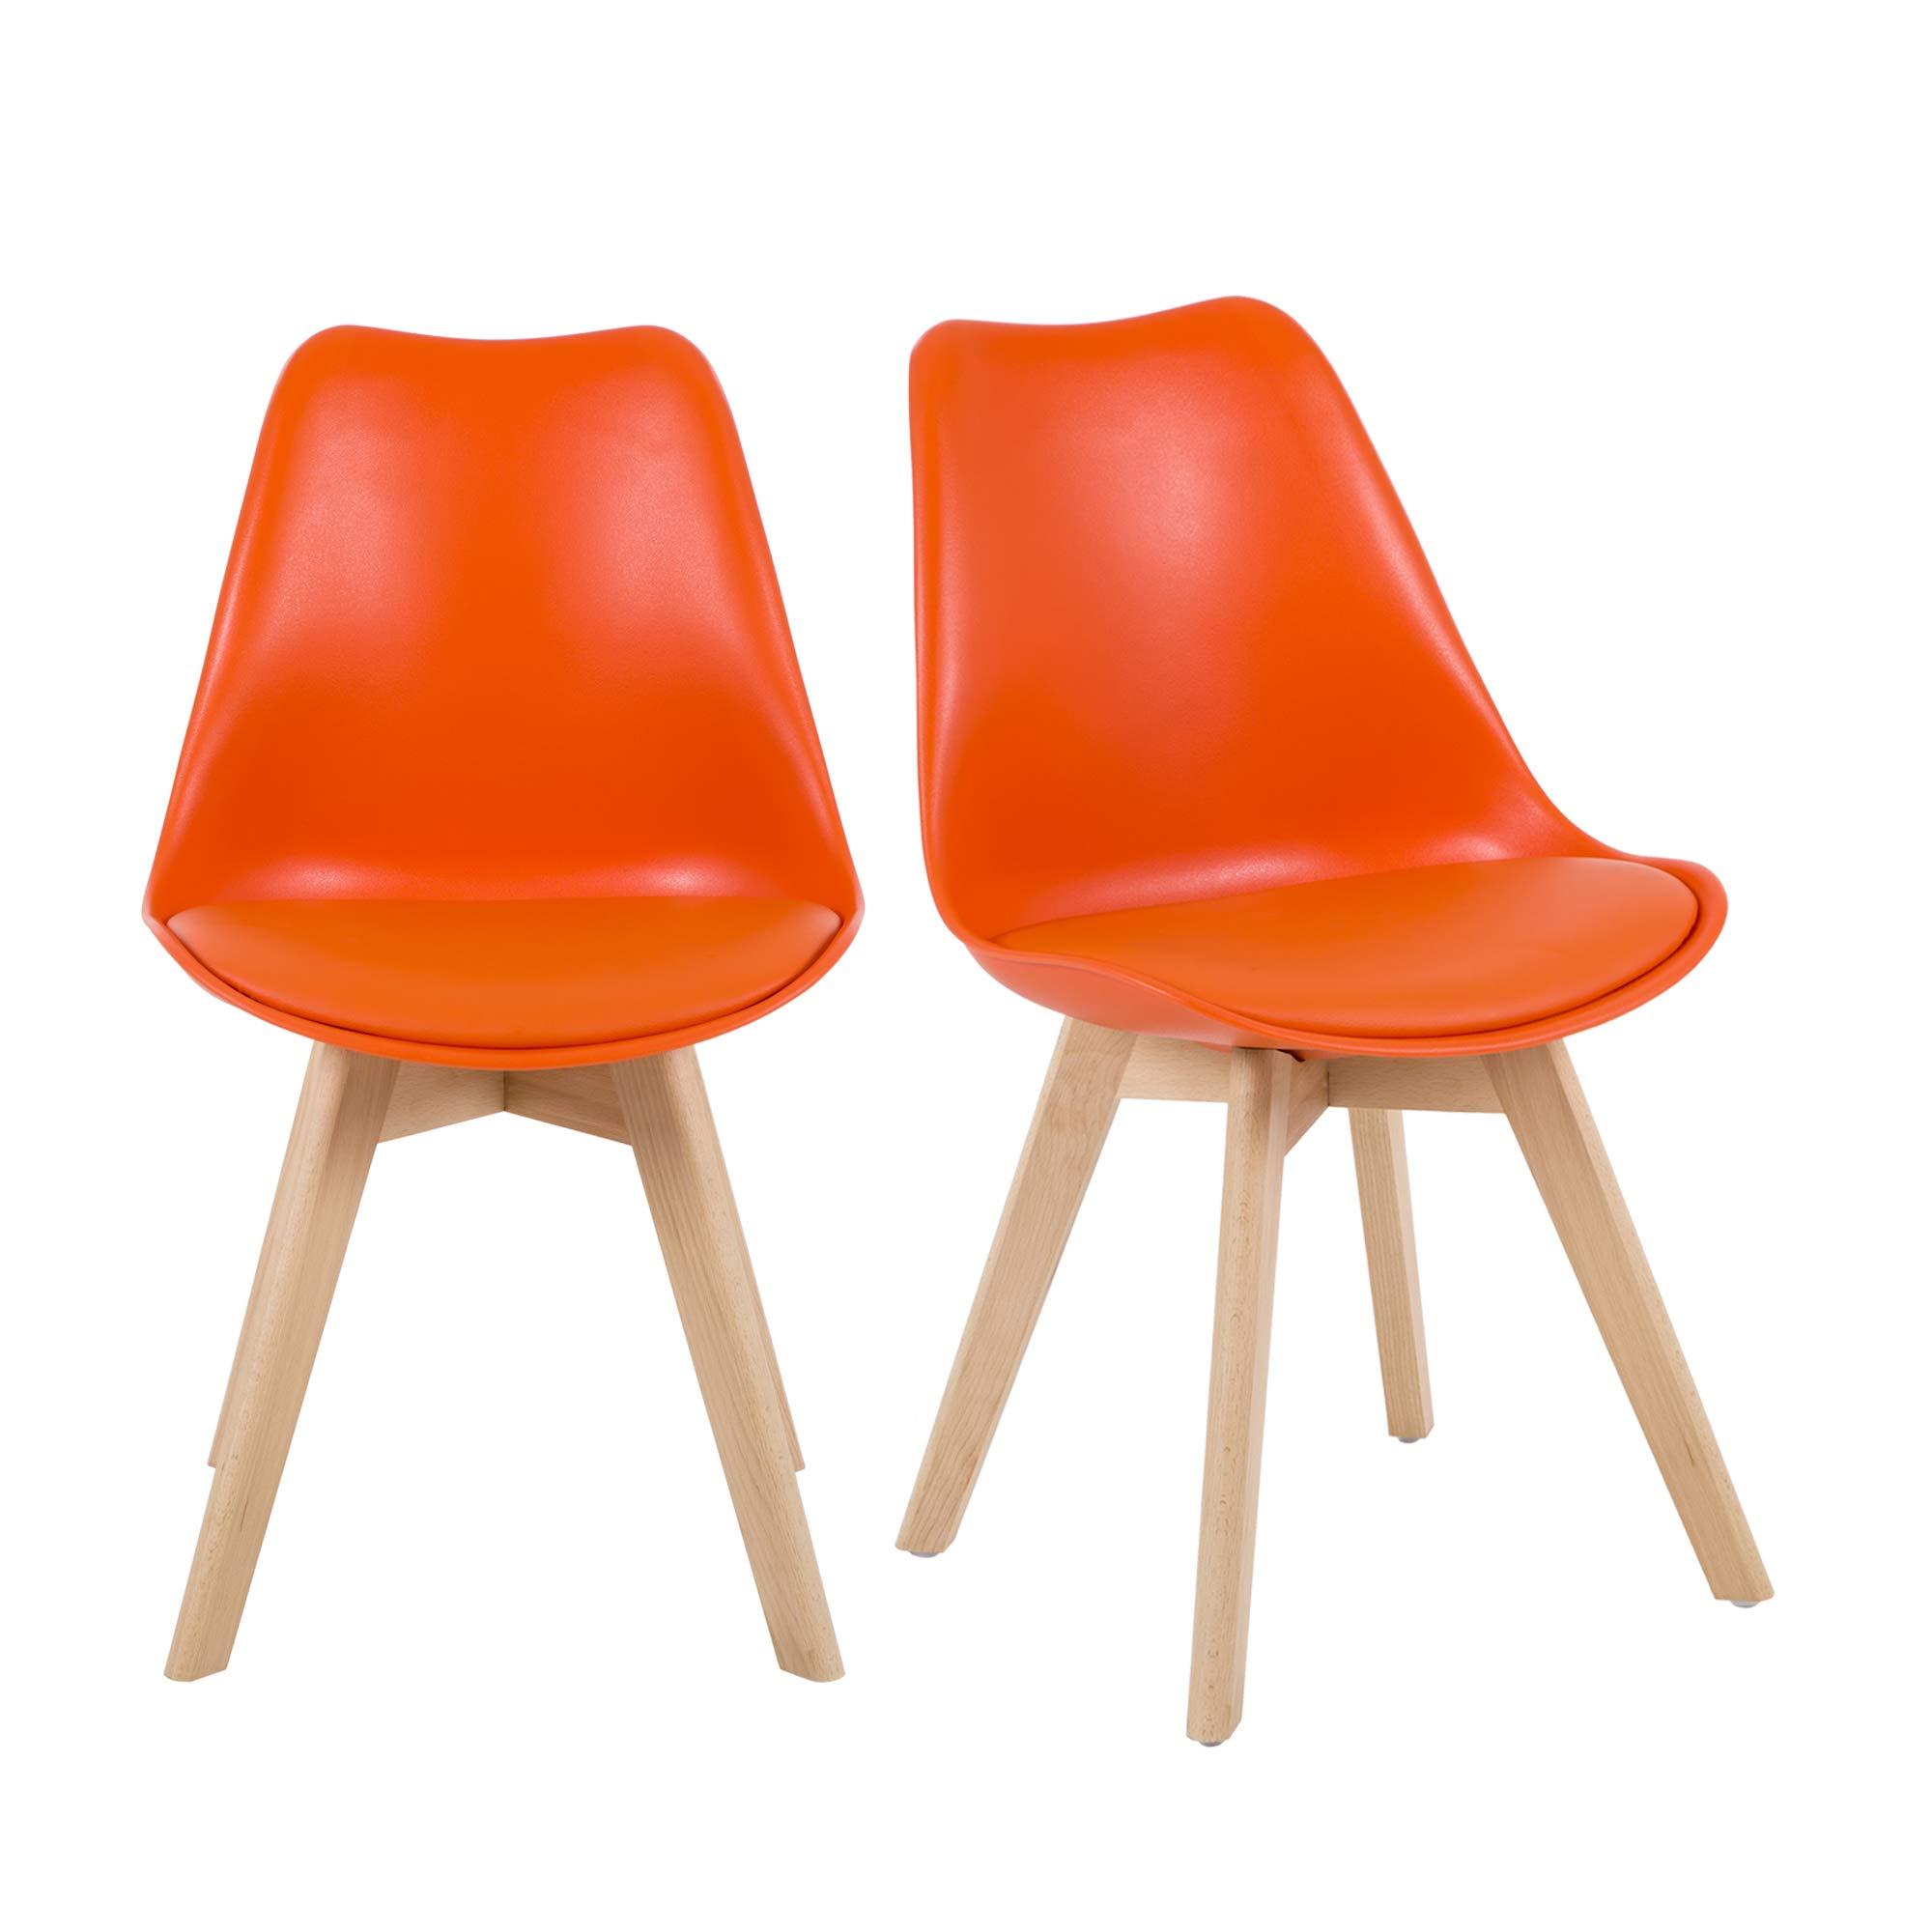 NOBPEINT Eames-Style Mid Century Dining Chairs,Set of 2(Orange)